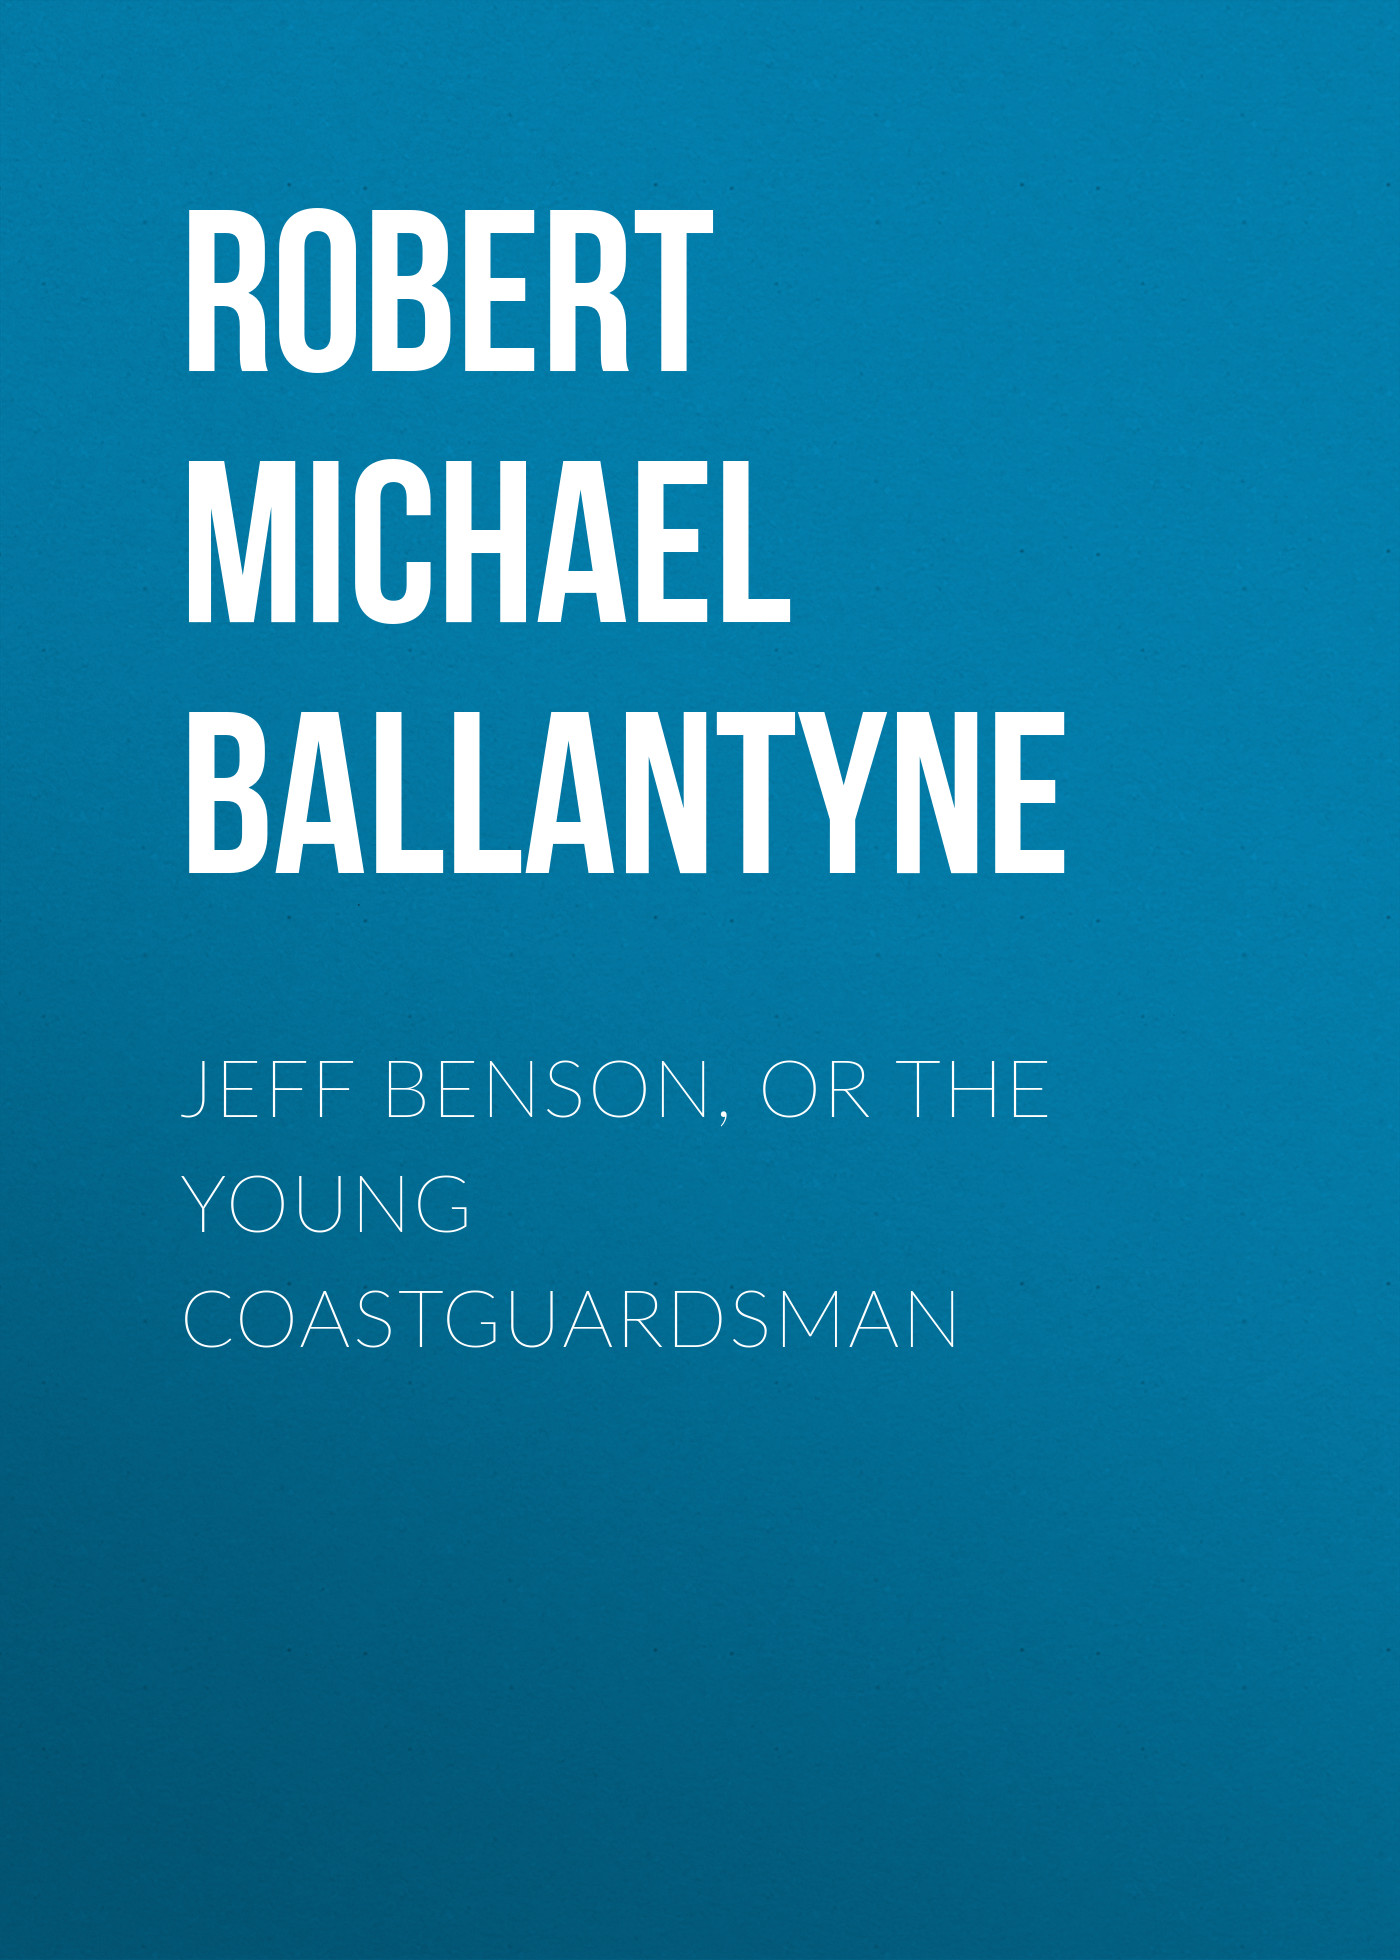 Jeff Benson, or the Young Coastguardsman